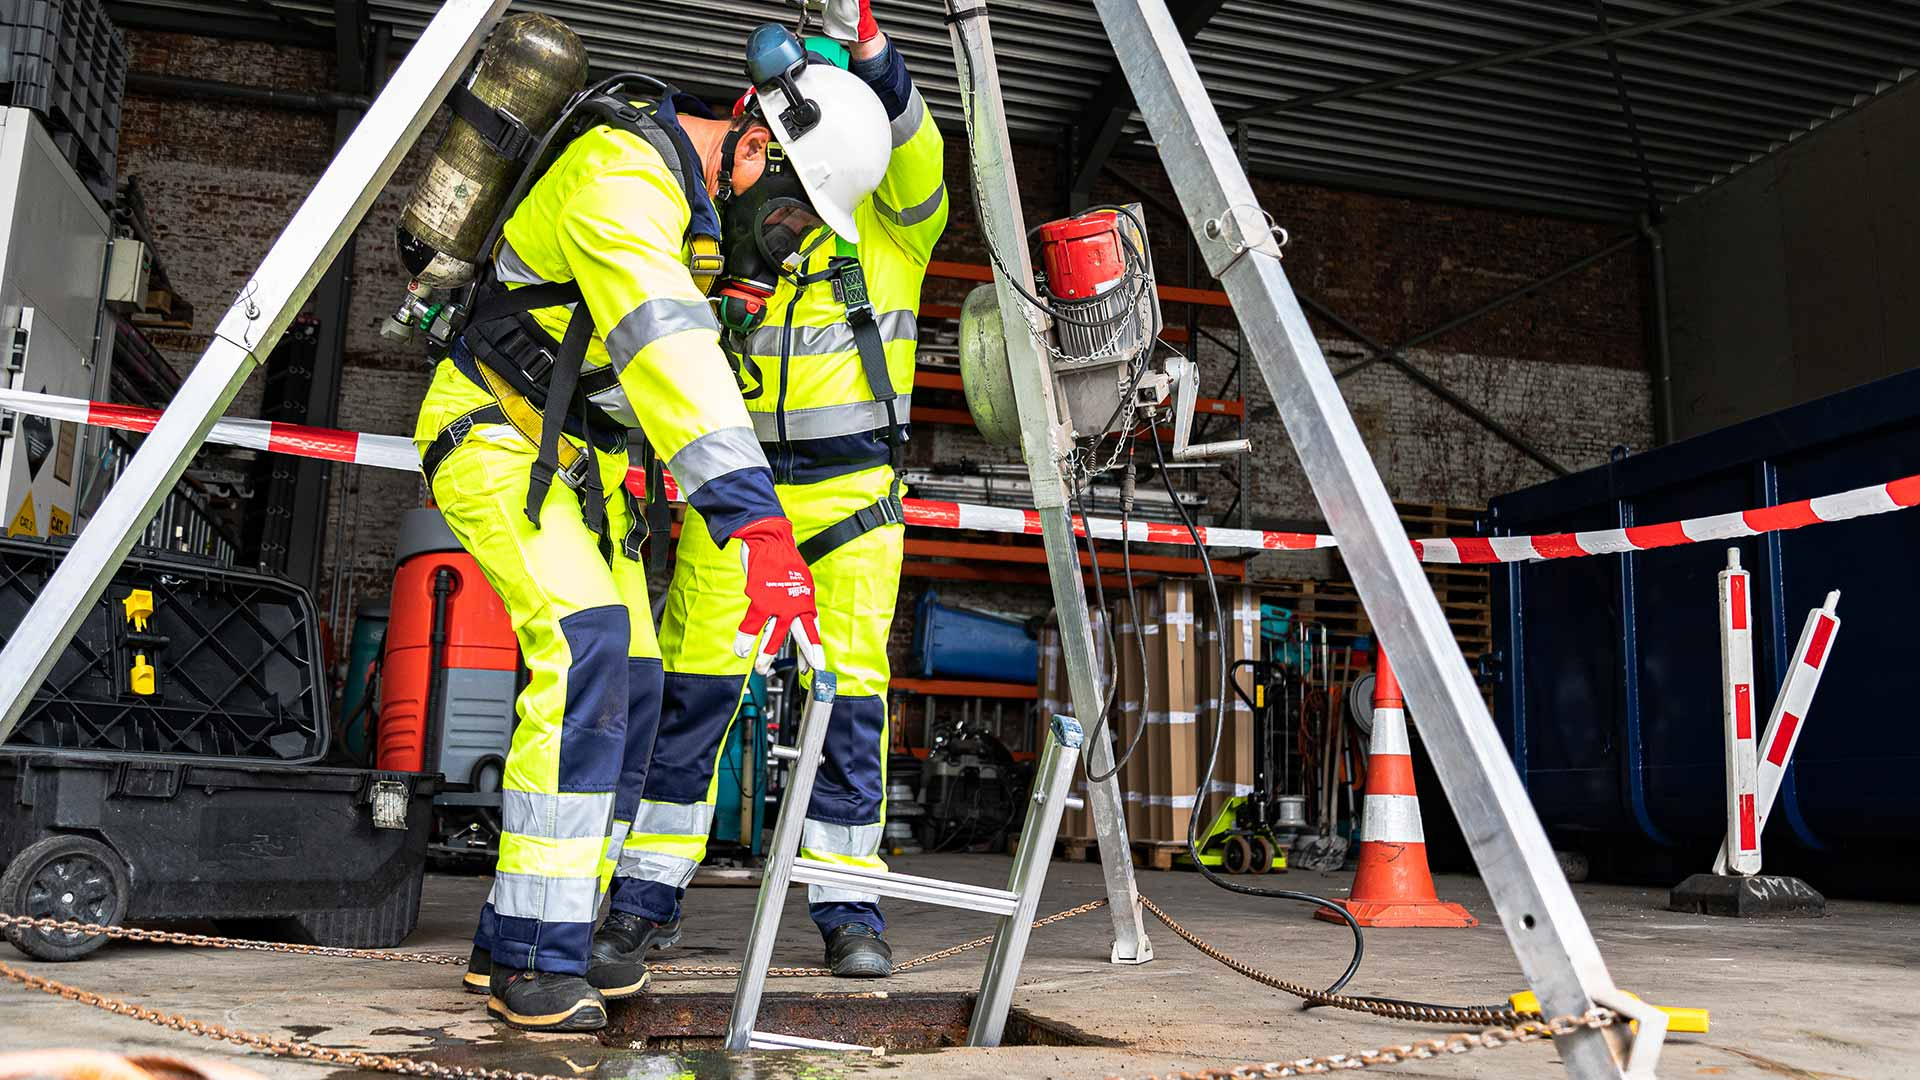 Outsourcen brand- en veiligheidswachten - Safety Masters